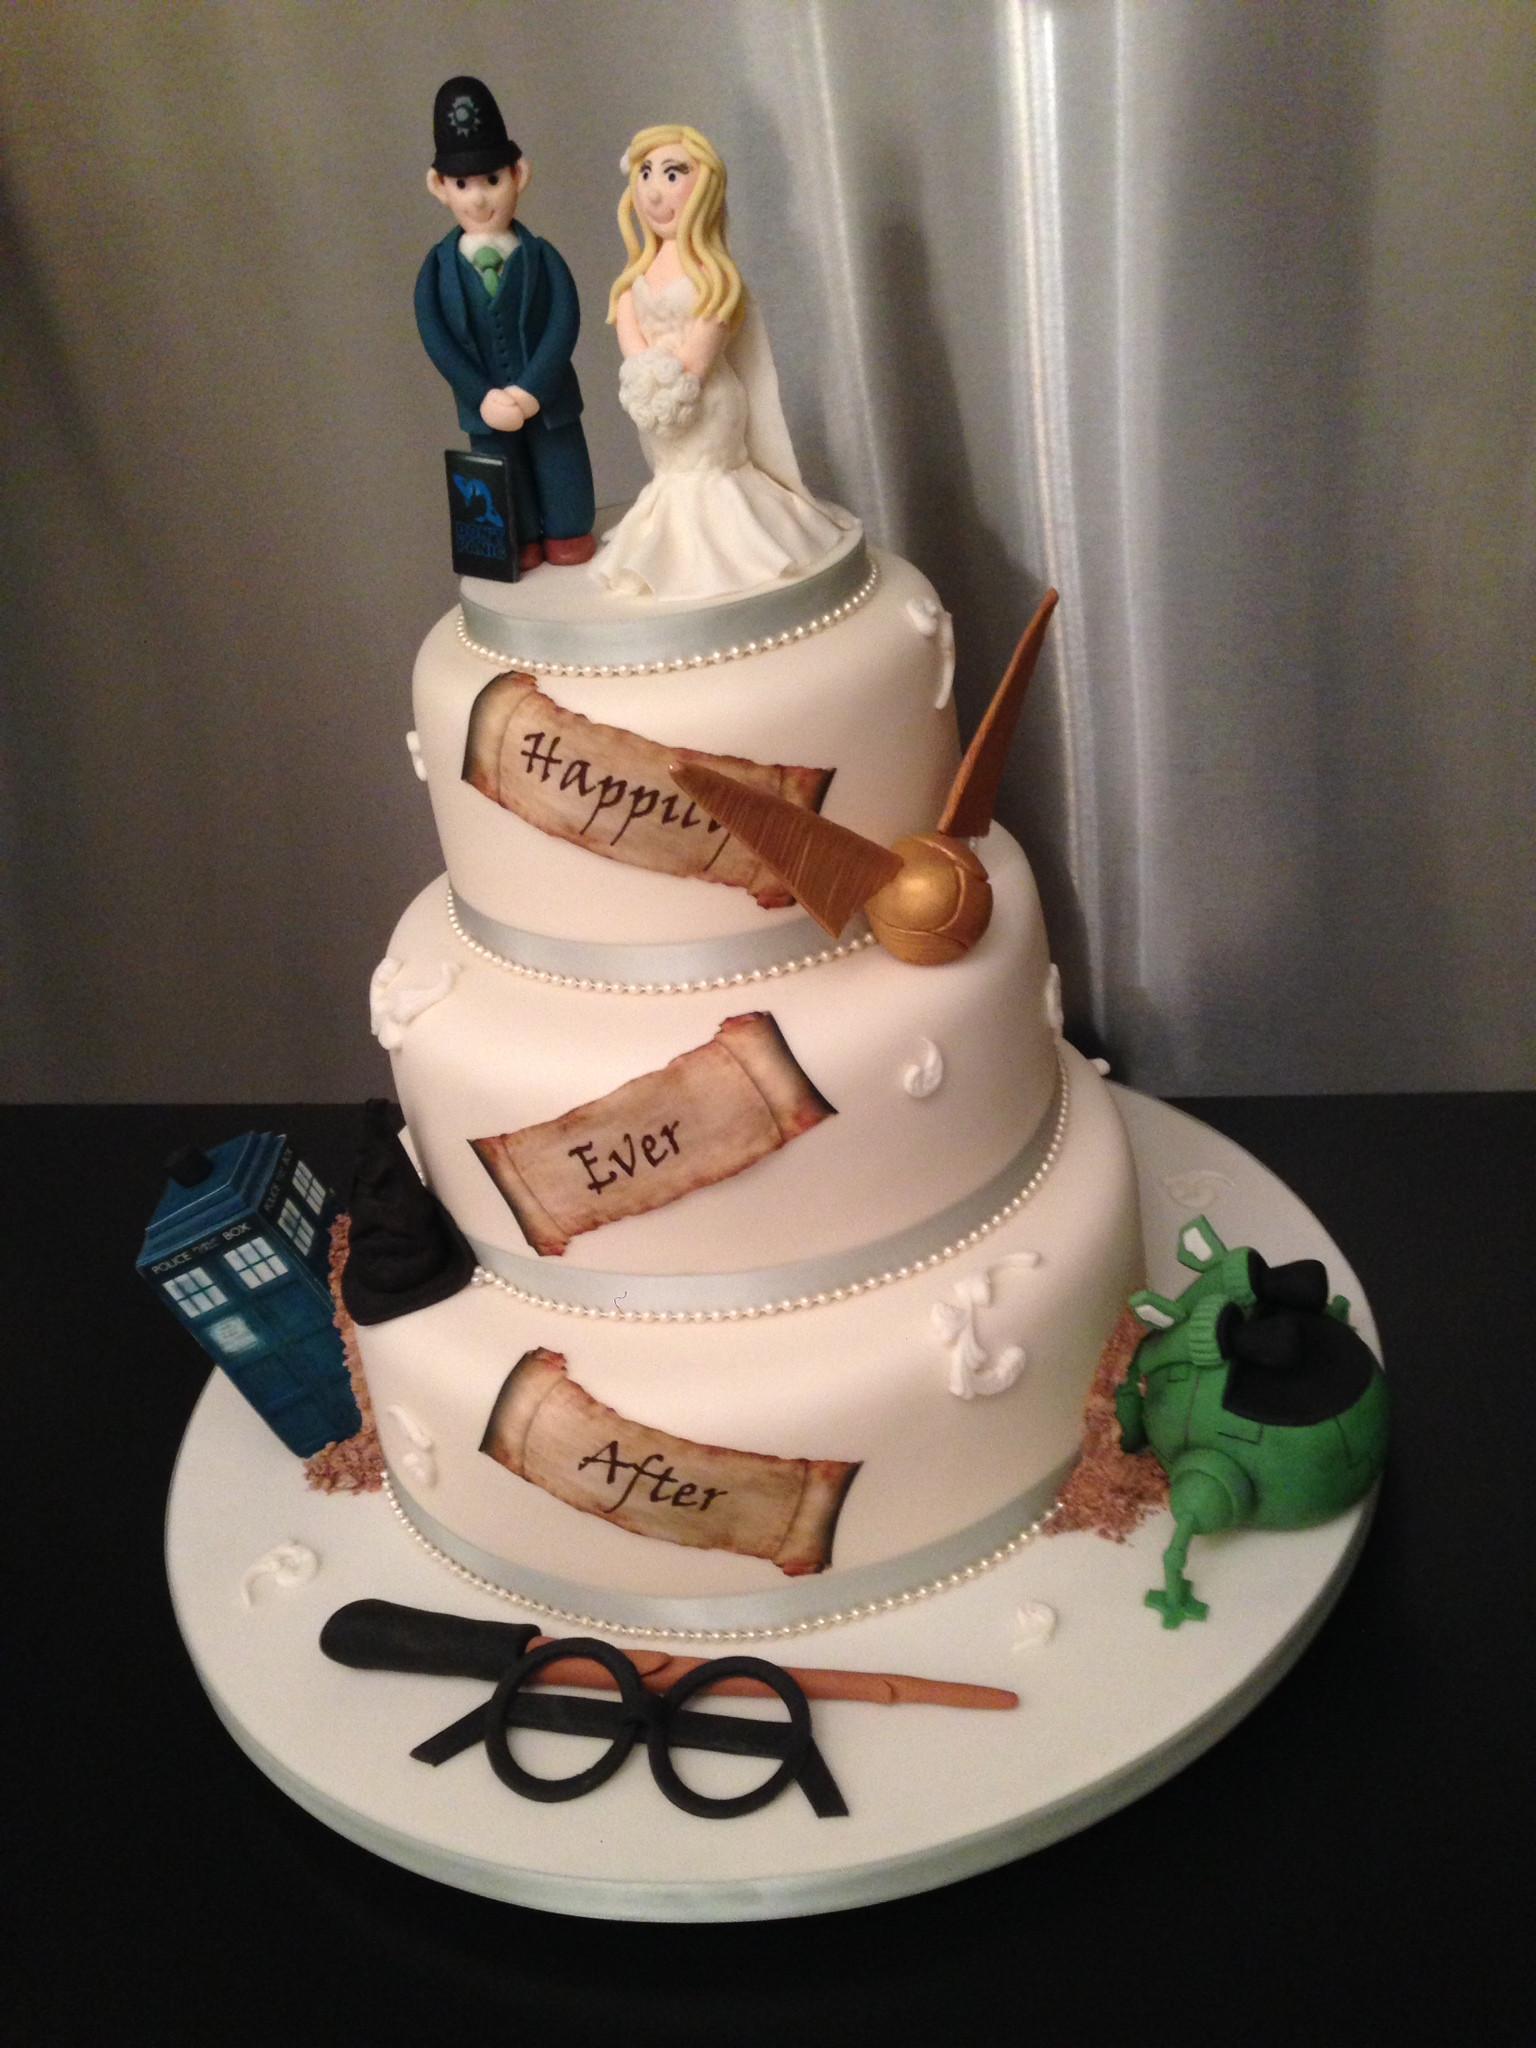 Geek Wedding Cakes  Wedding Cakes SugarPerfection